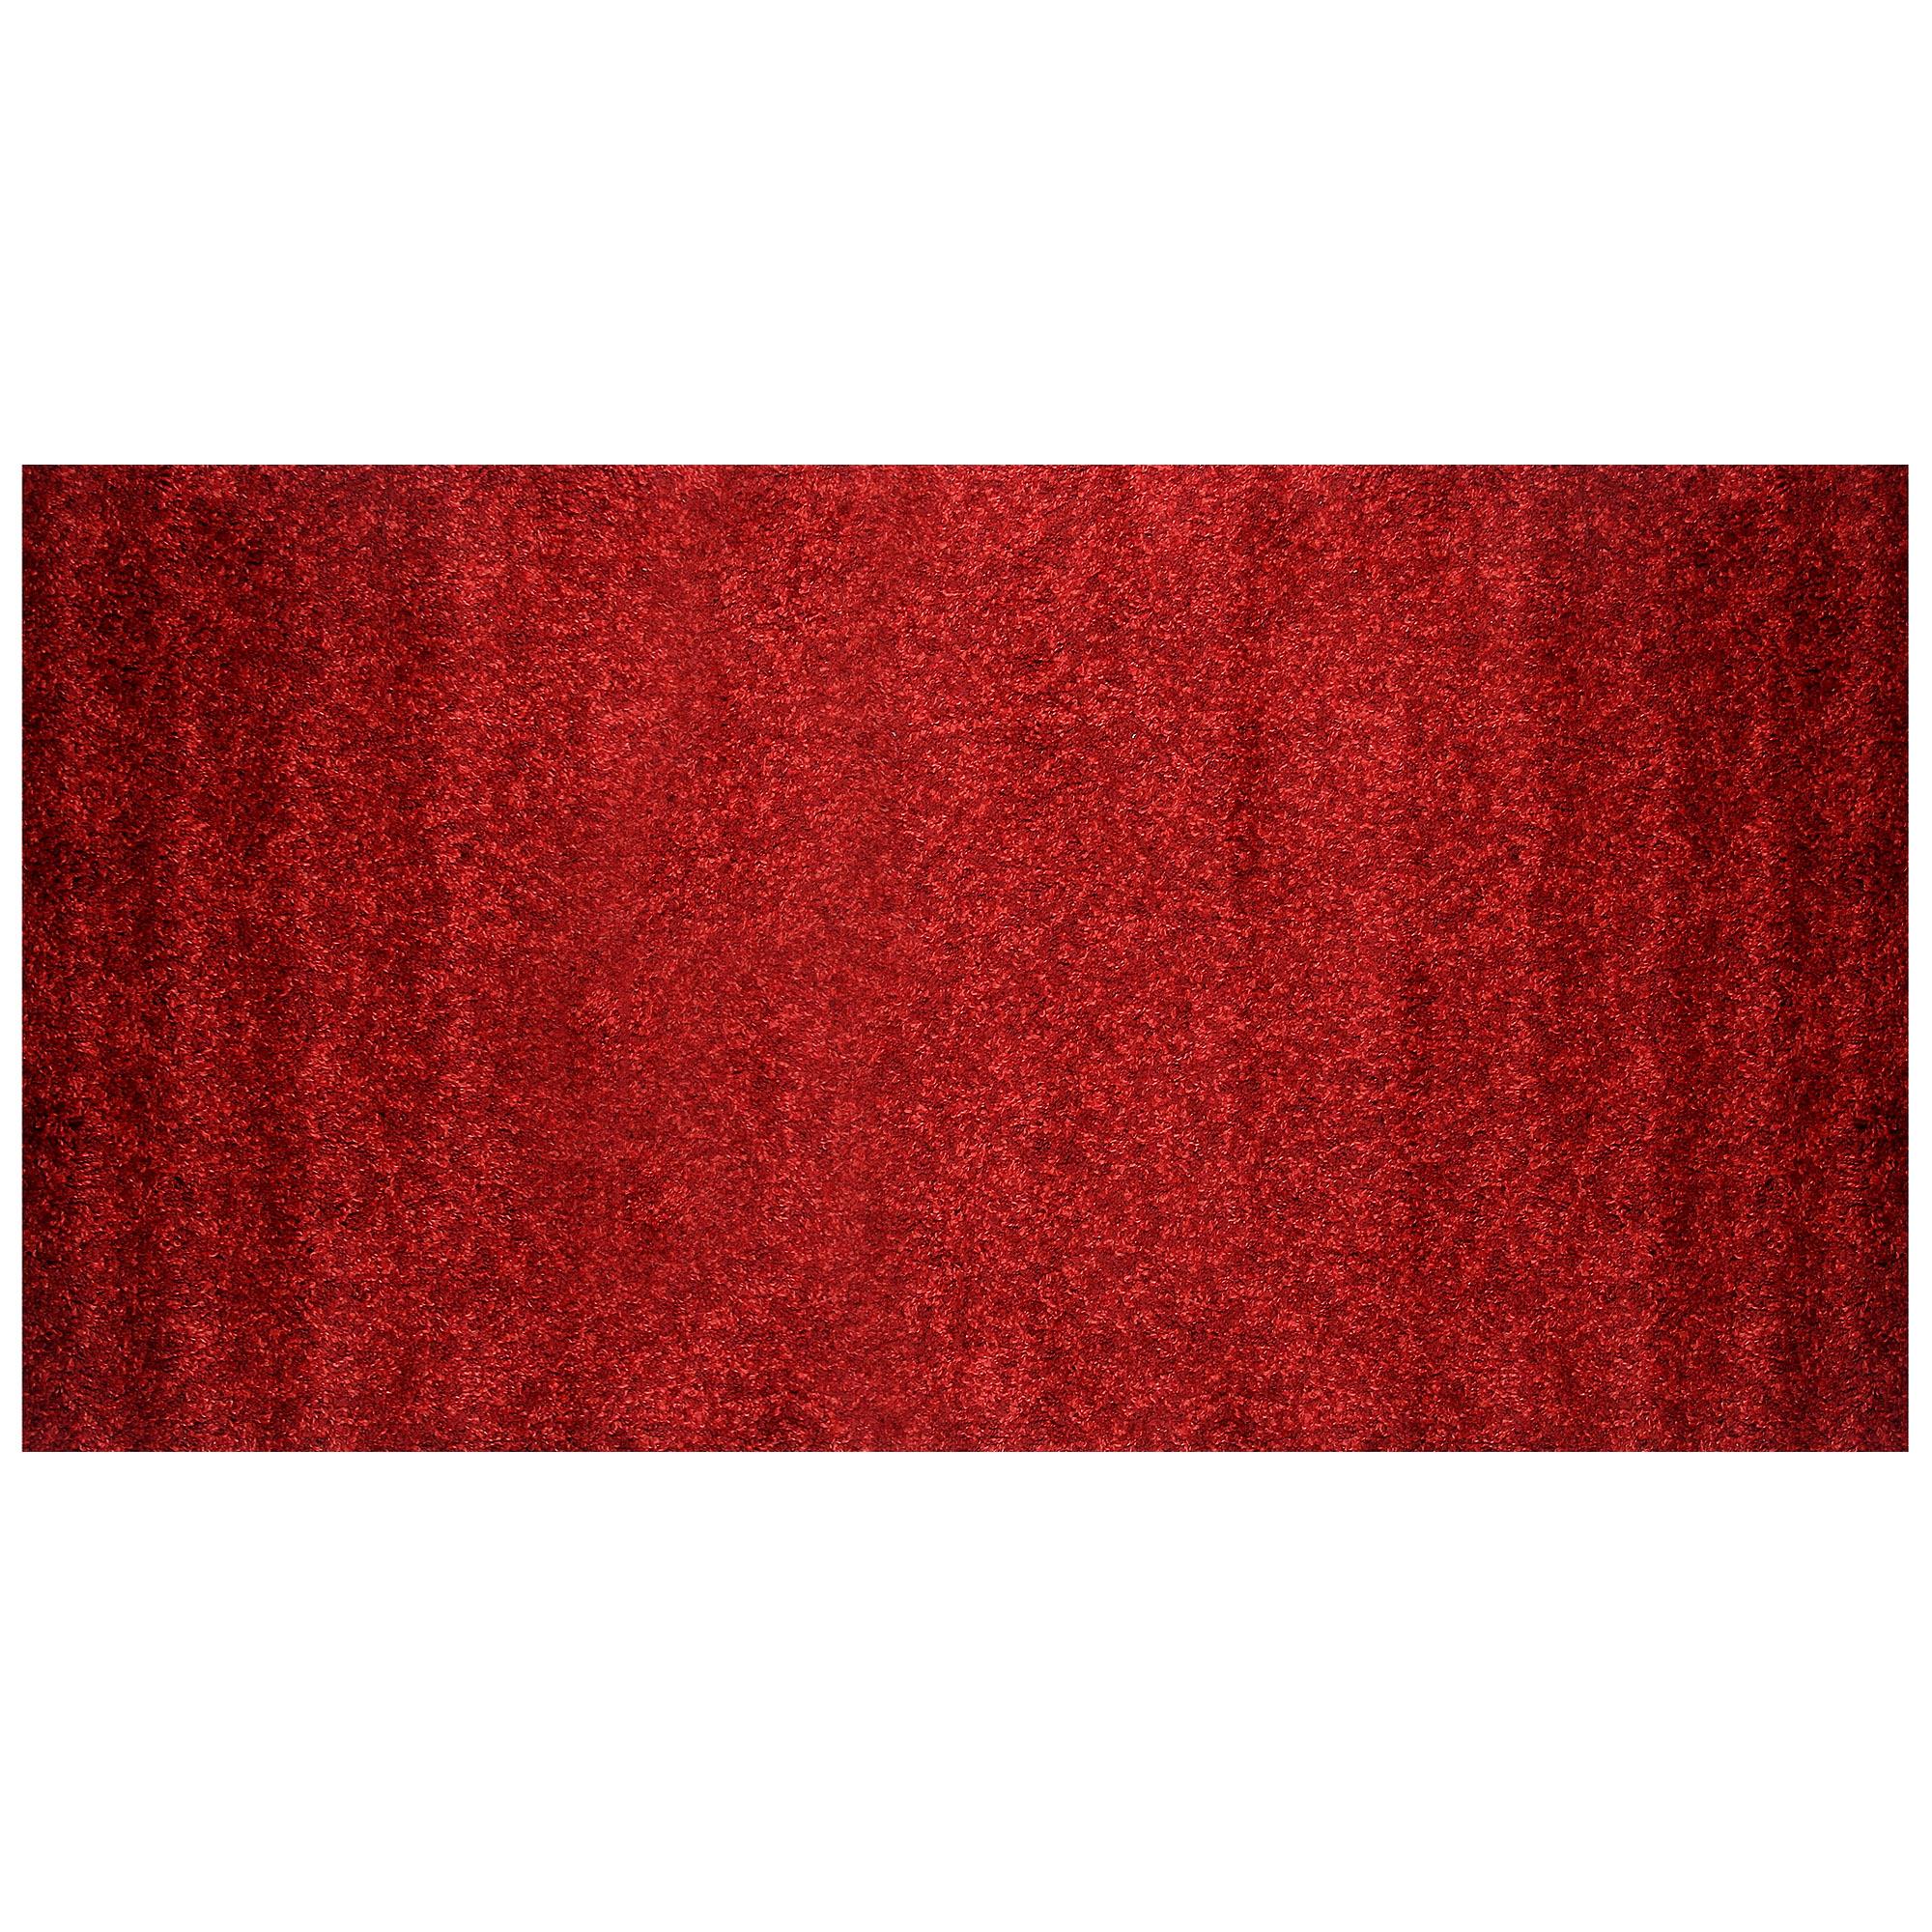 Коврик красный Abc curly 150х80